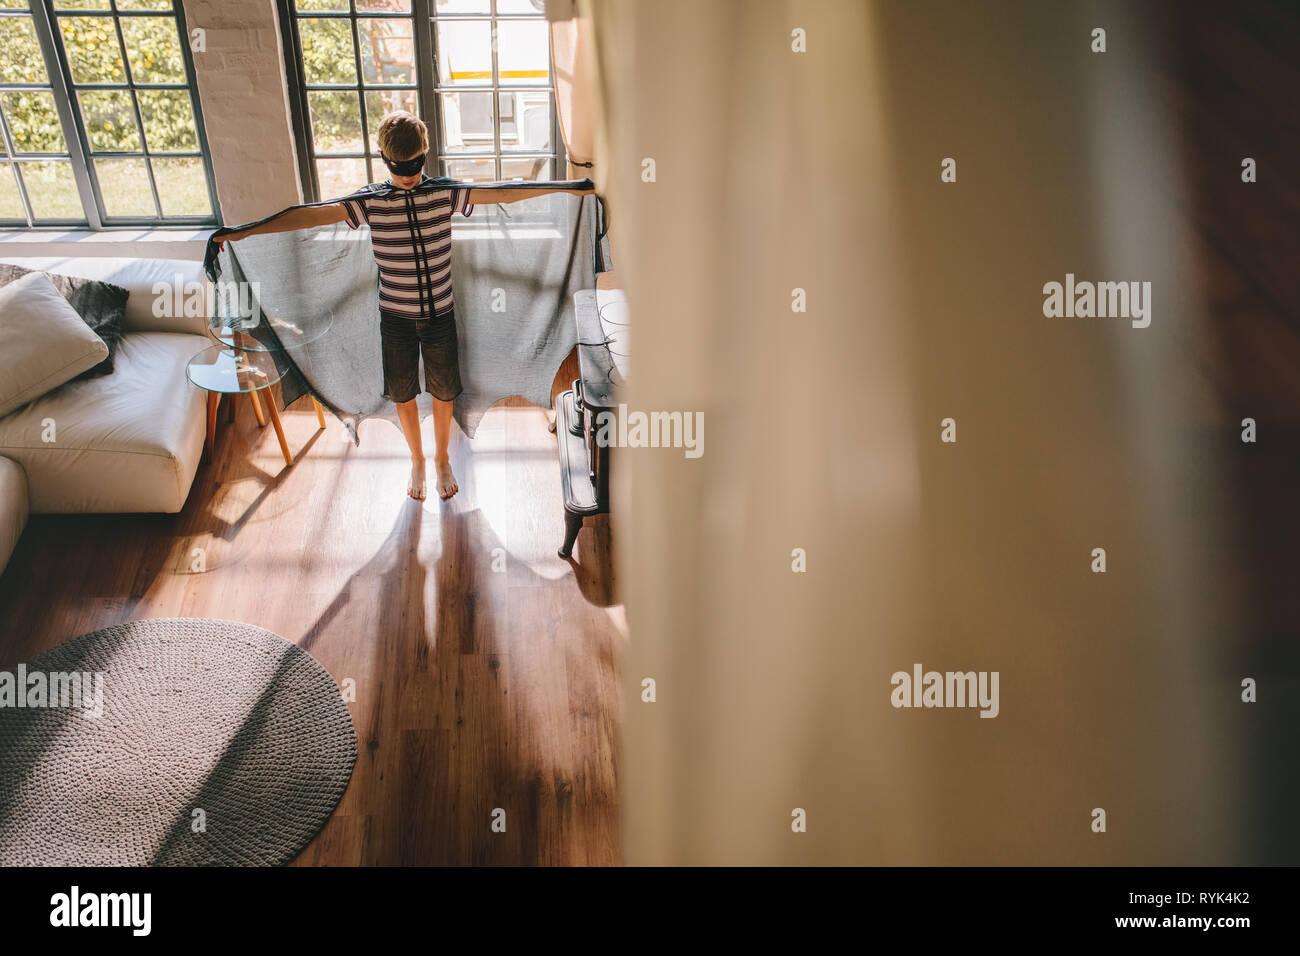 Boy pretending to a bat superhero. Boy playing in Bat costume at home. - Stock Image